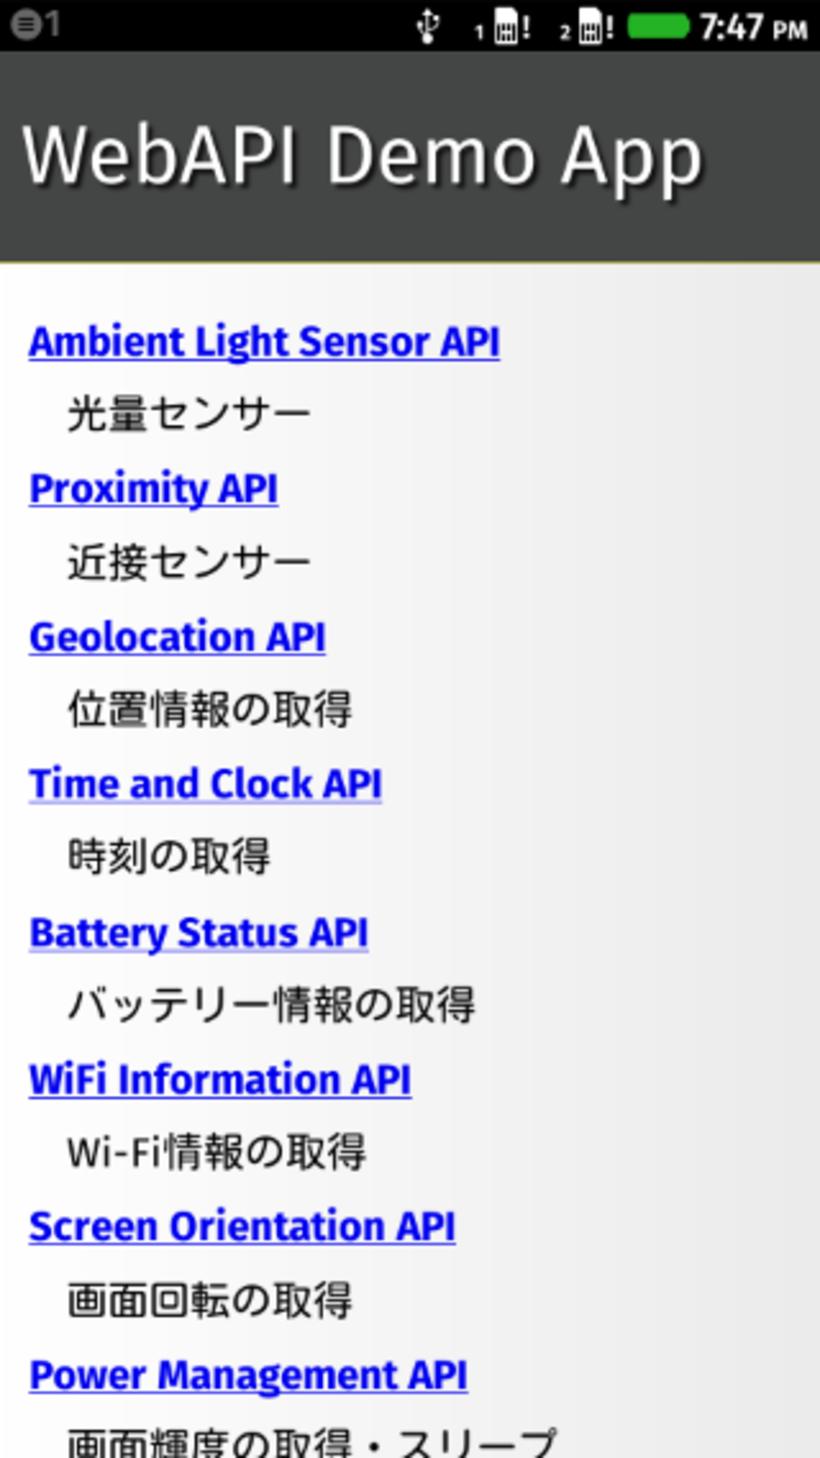 CHUO-U-OpenProject/WebAPIDemo : Memos/Screen Orientation API